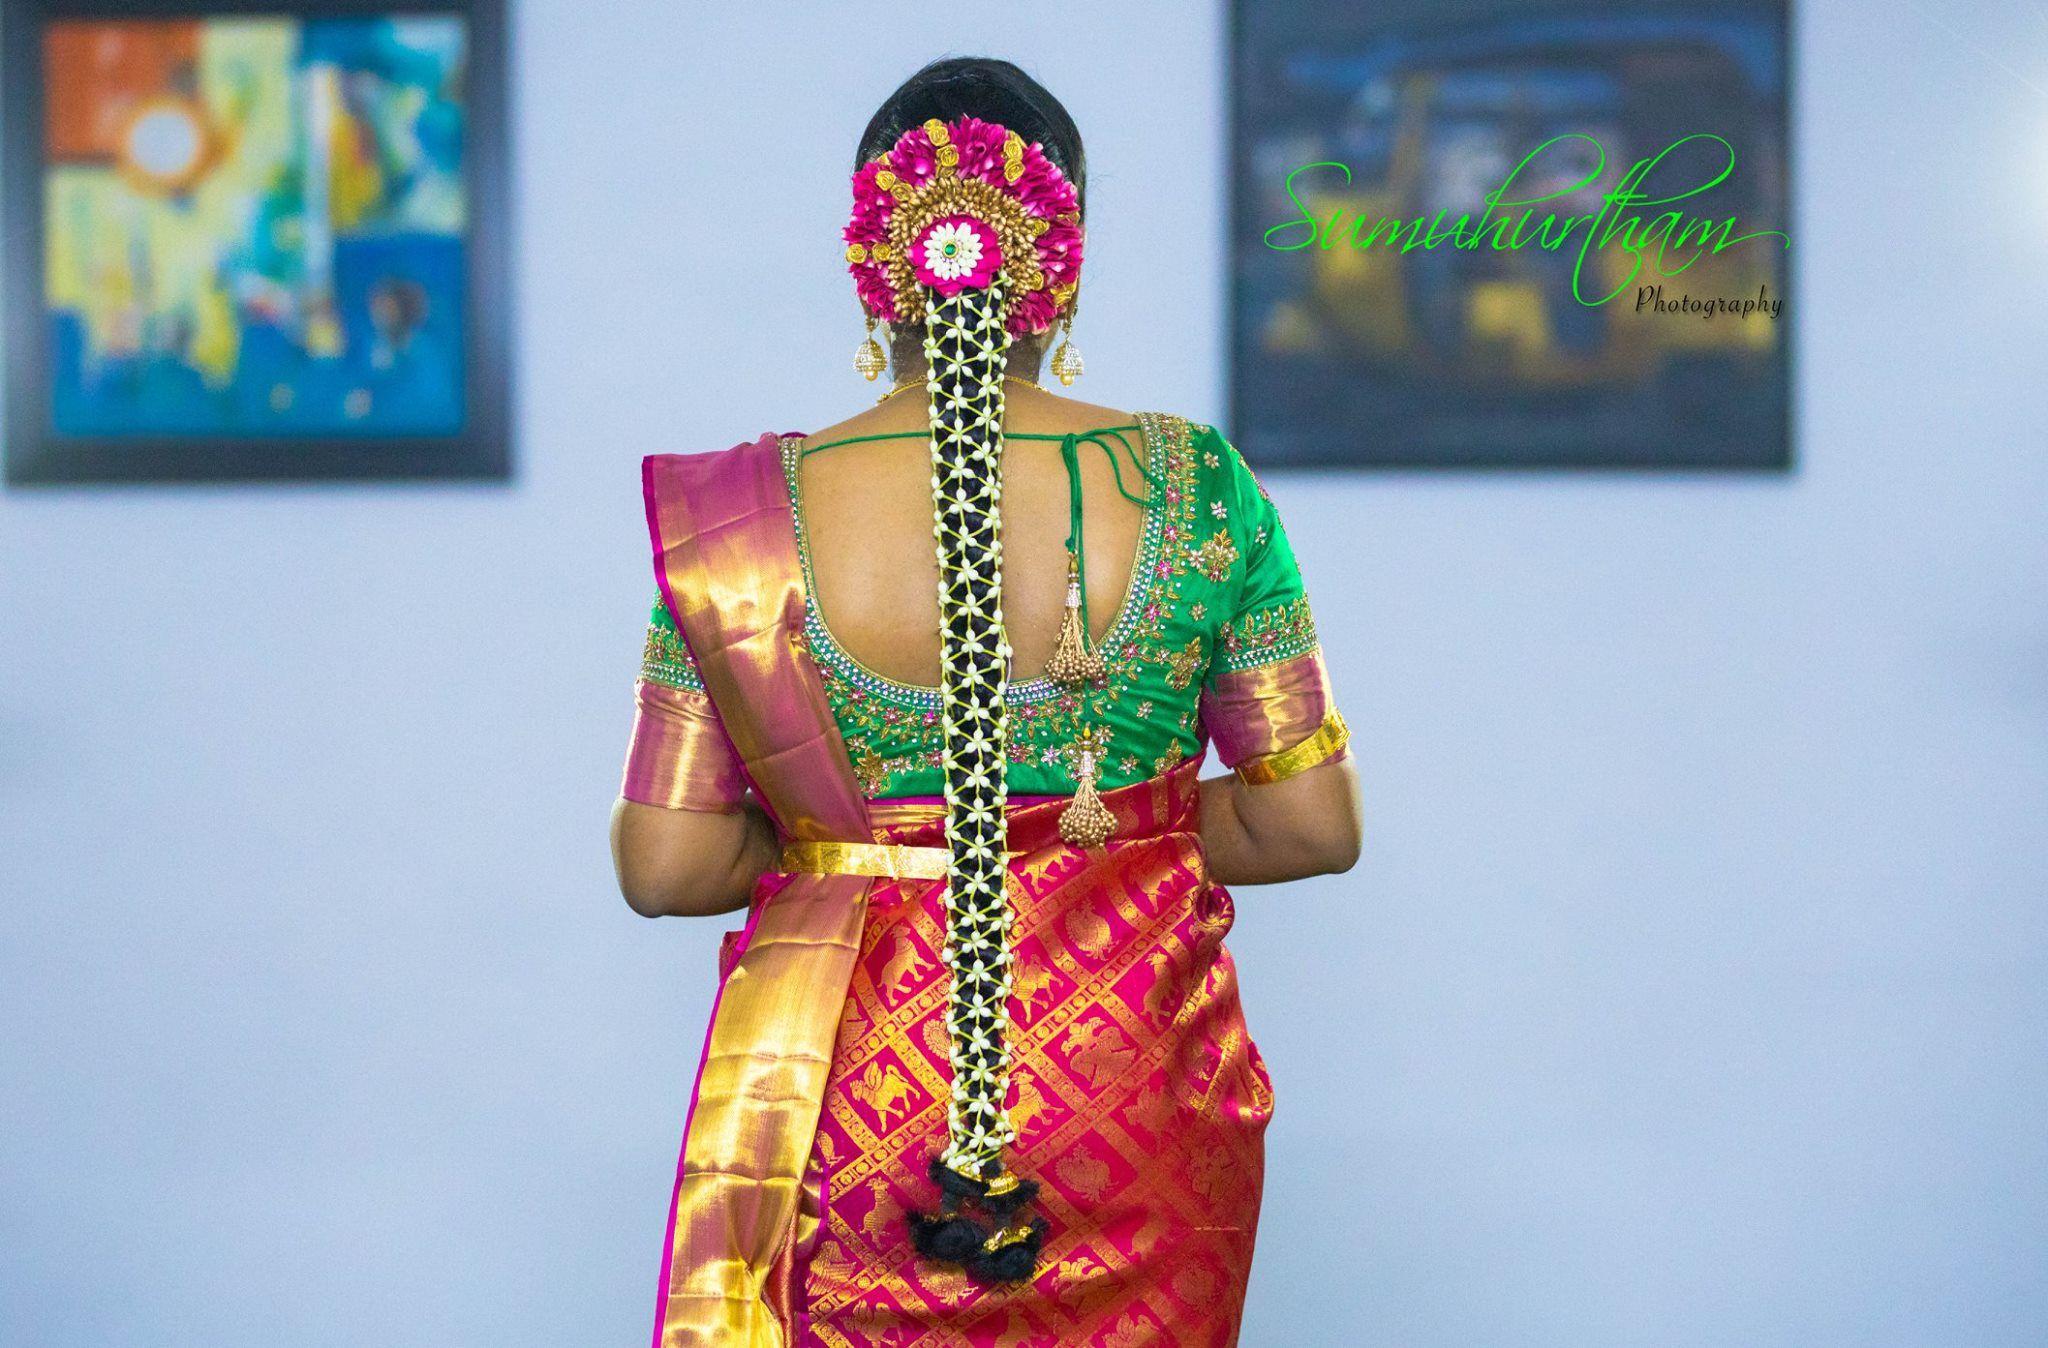 Sumuhurtham wedding photography. <br>Contact : 090008 11045.